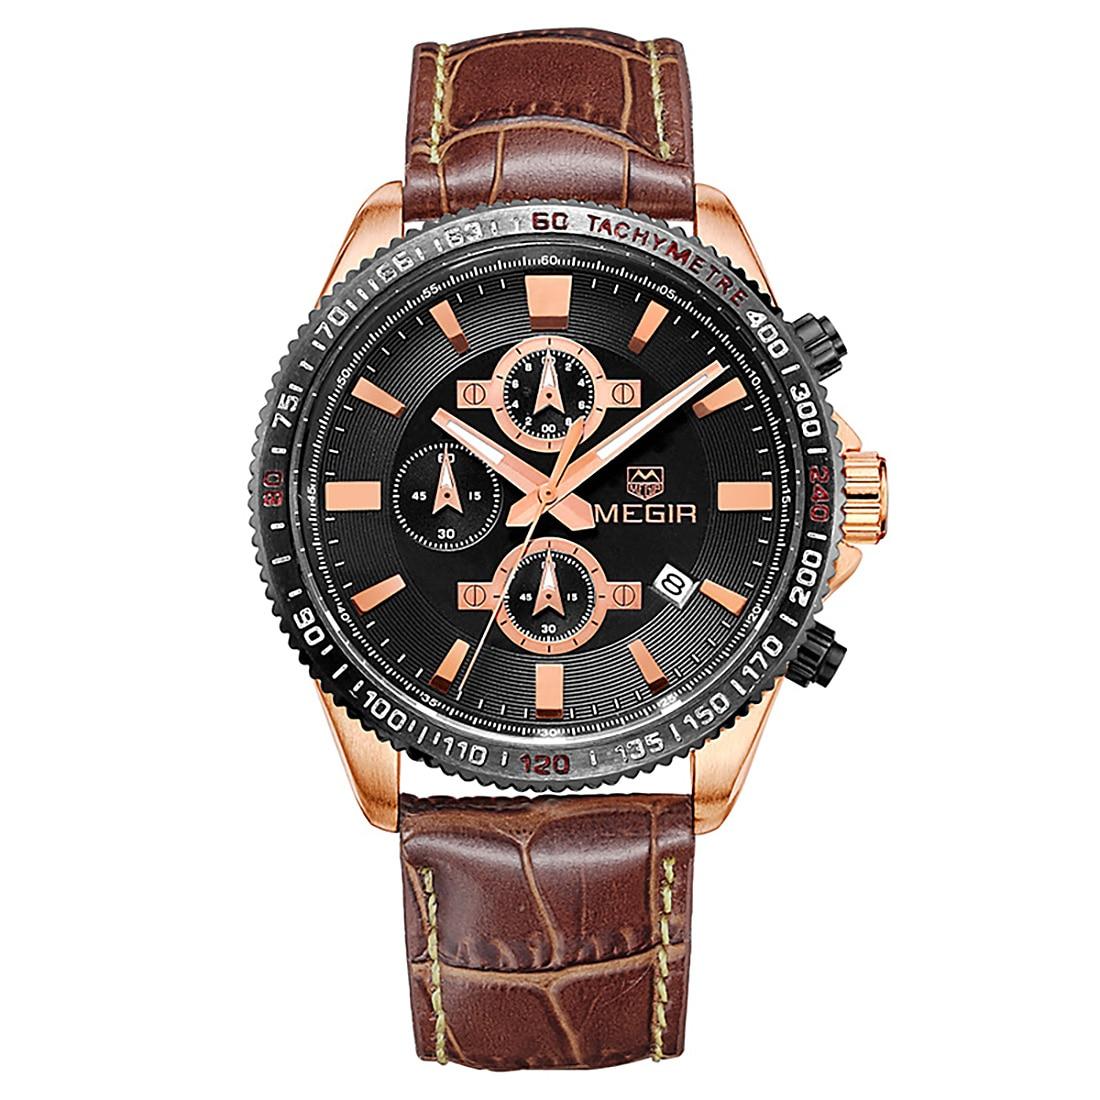 Men Luxury Genuine Leather Quartz Business Formal Wristwatch Large Man Sport Watches Relogios Masculinos Hot Sale Dropship Saat luxury brand bobo bird men watches wooden quartz wristwatch genuine leather strap relogios masculinos b m14